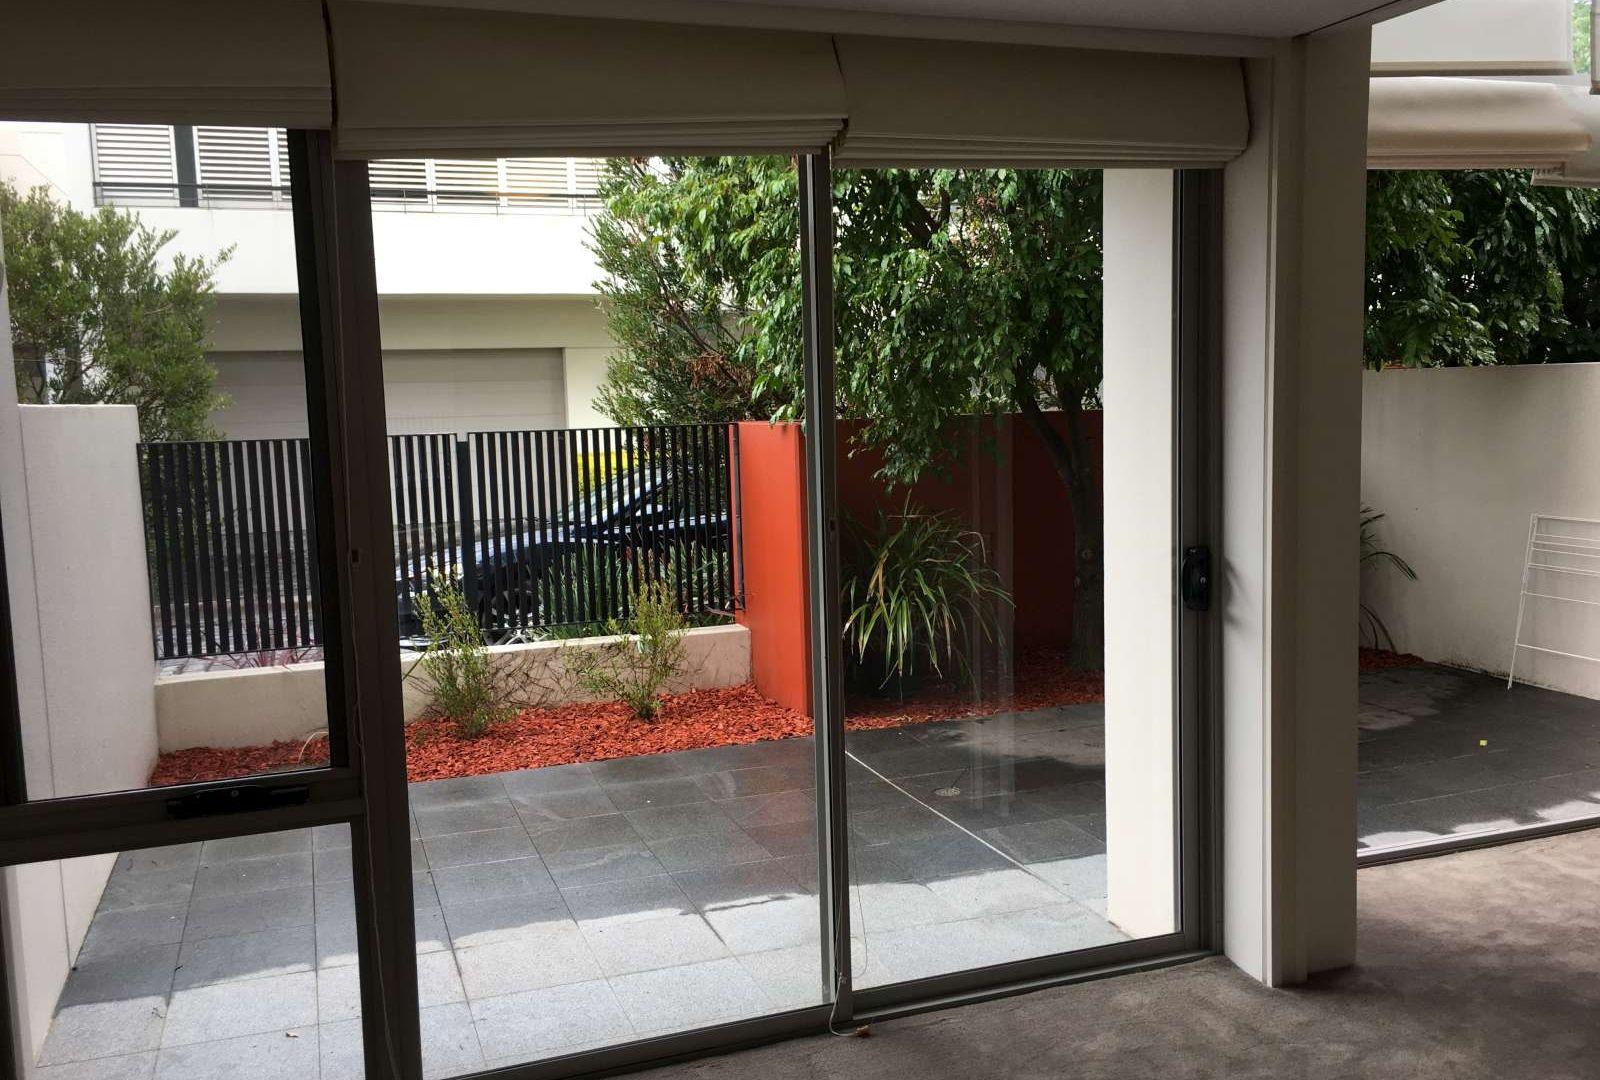 64/1 Bayside Terrace, Cabarita NSW 2137, Image 1